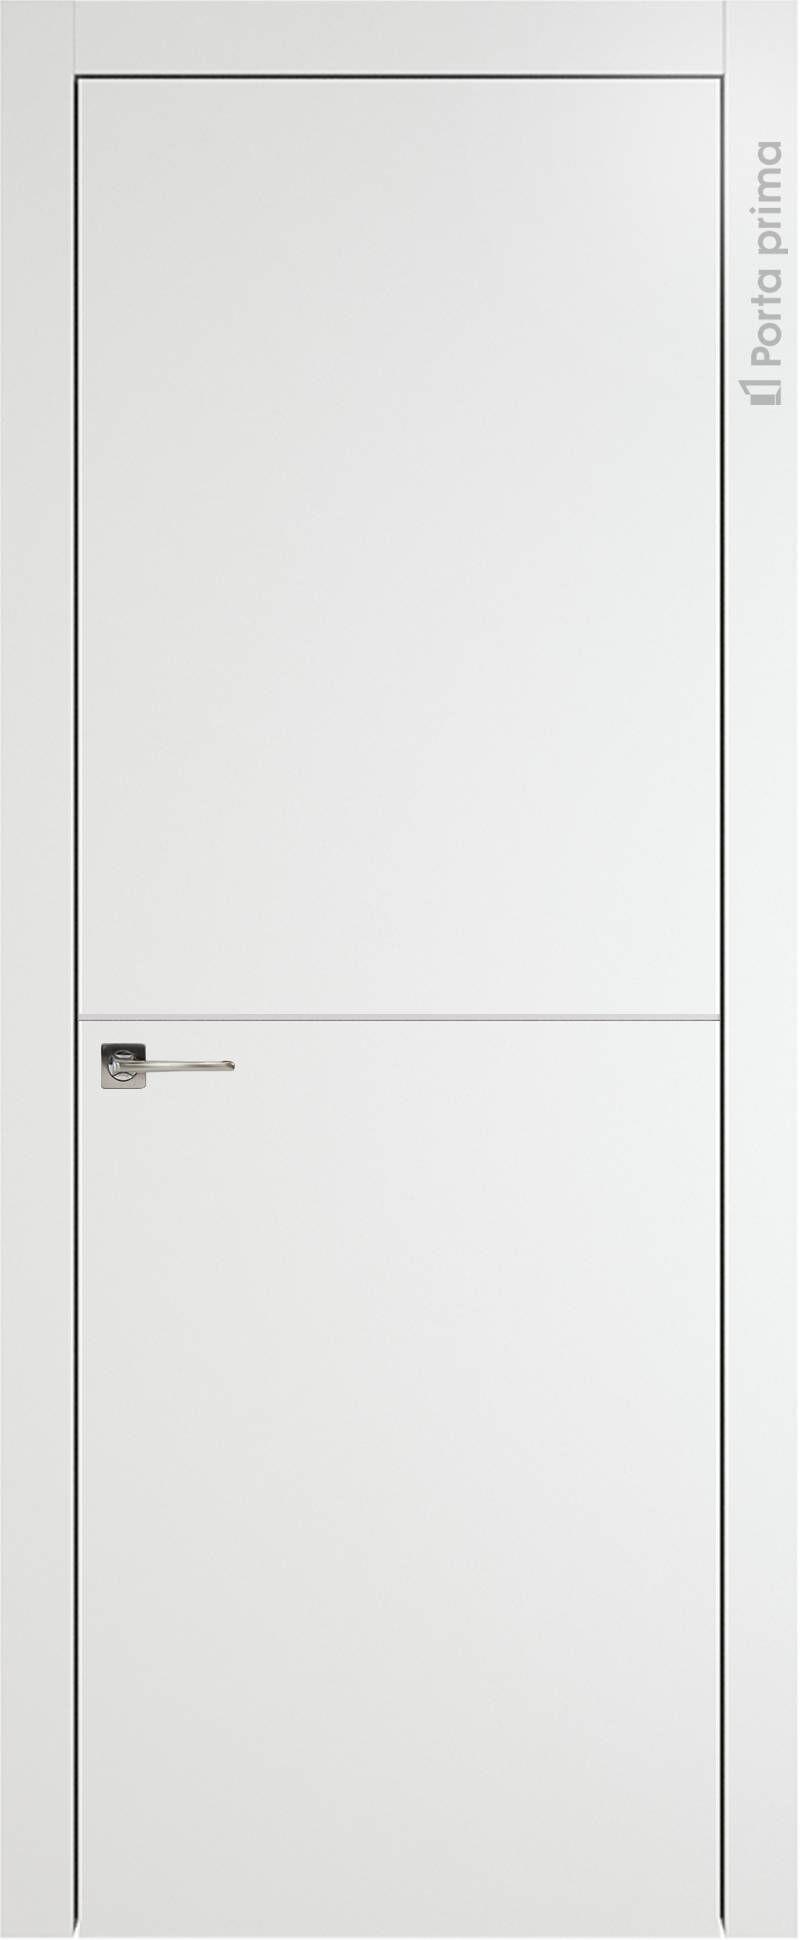 Tivoli Б-3 цвет - Белая эмаль (RAL 9003) Без стекла (ДГ)